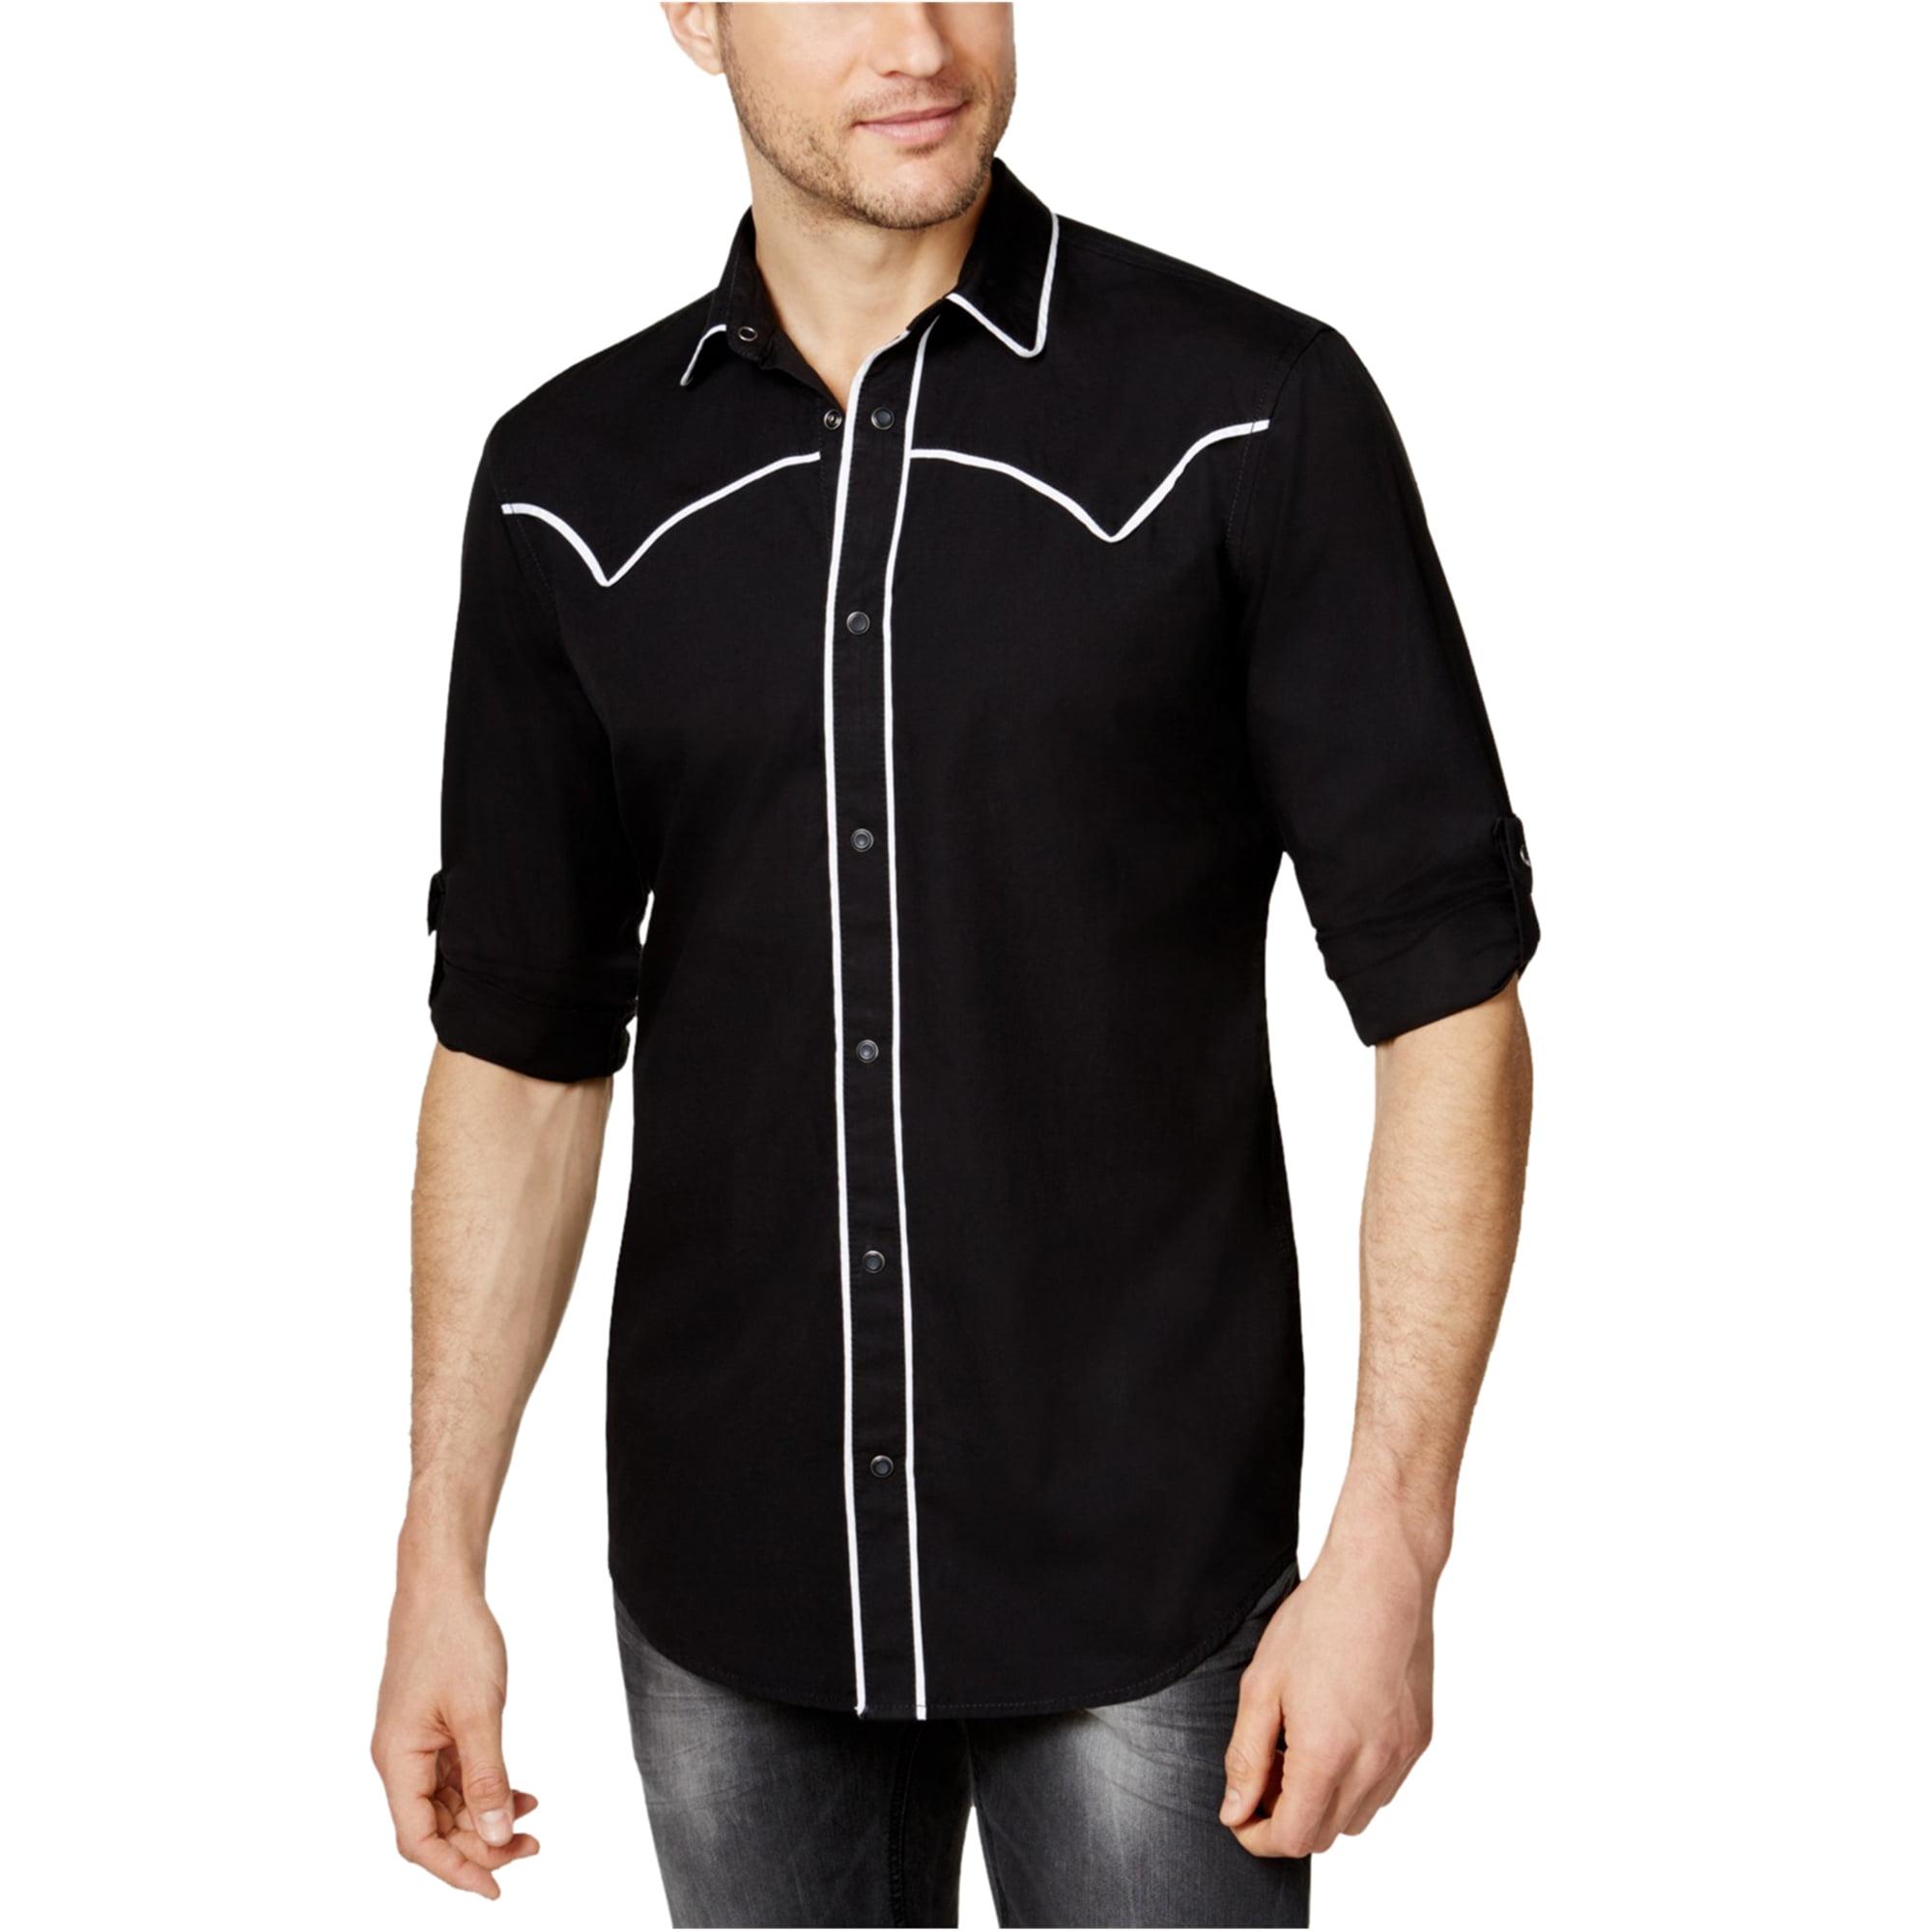 New Mens INC International Concepts Western Style Black Convertible Sleeve Shirt